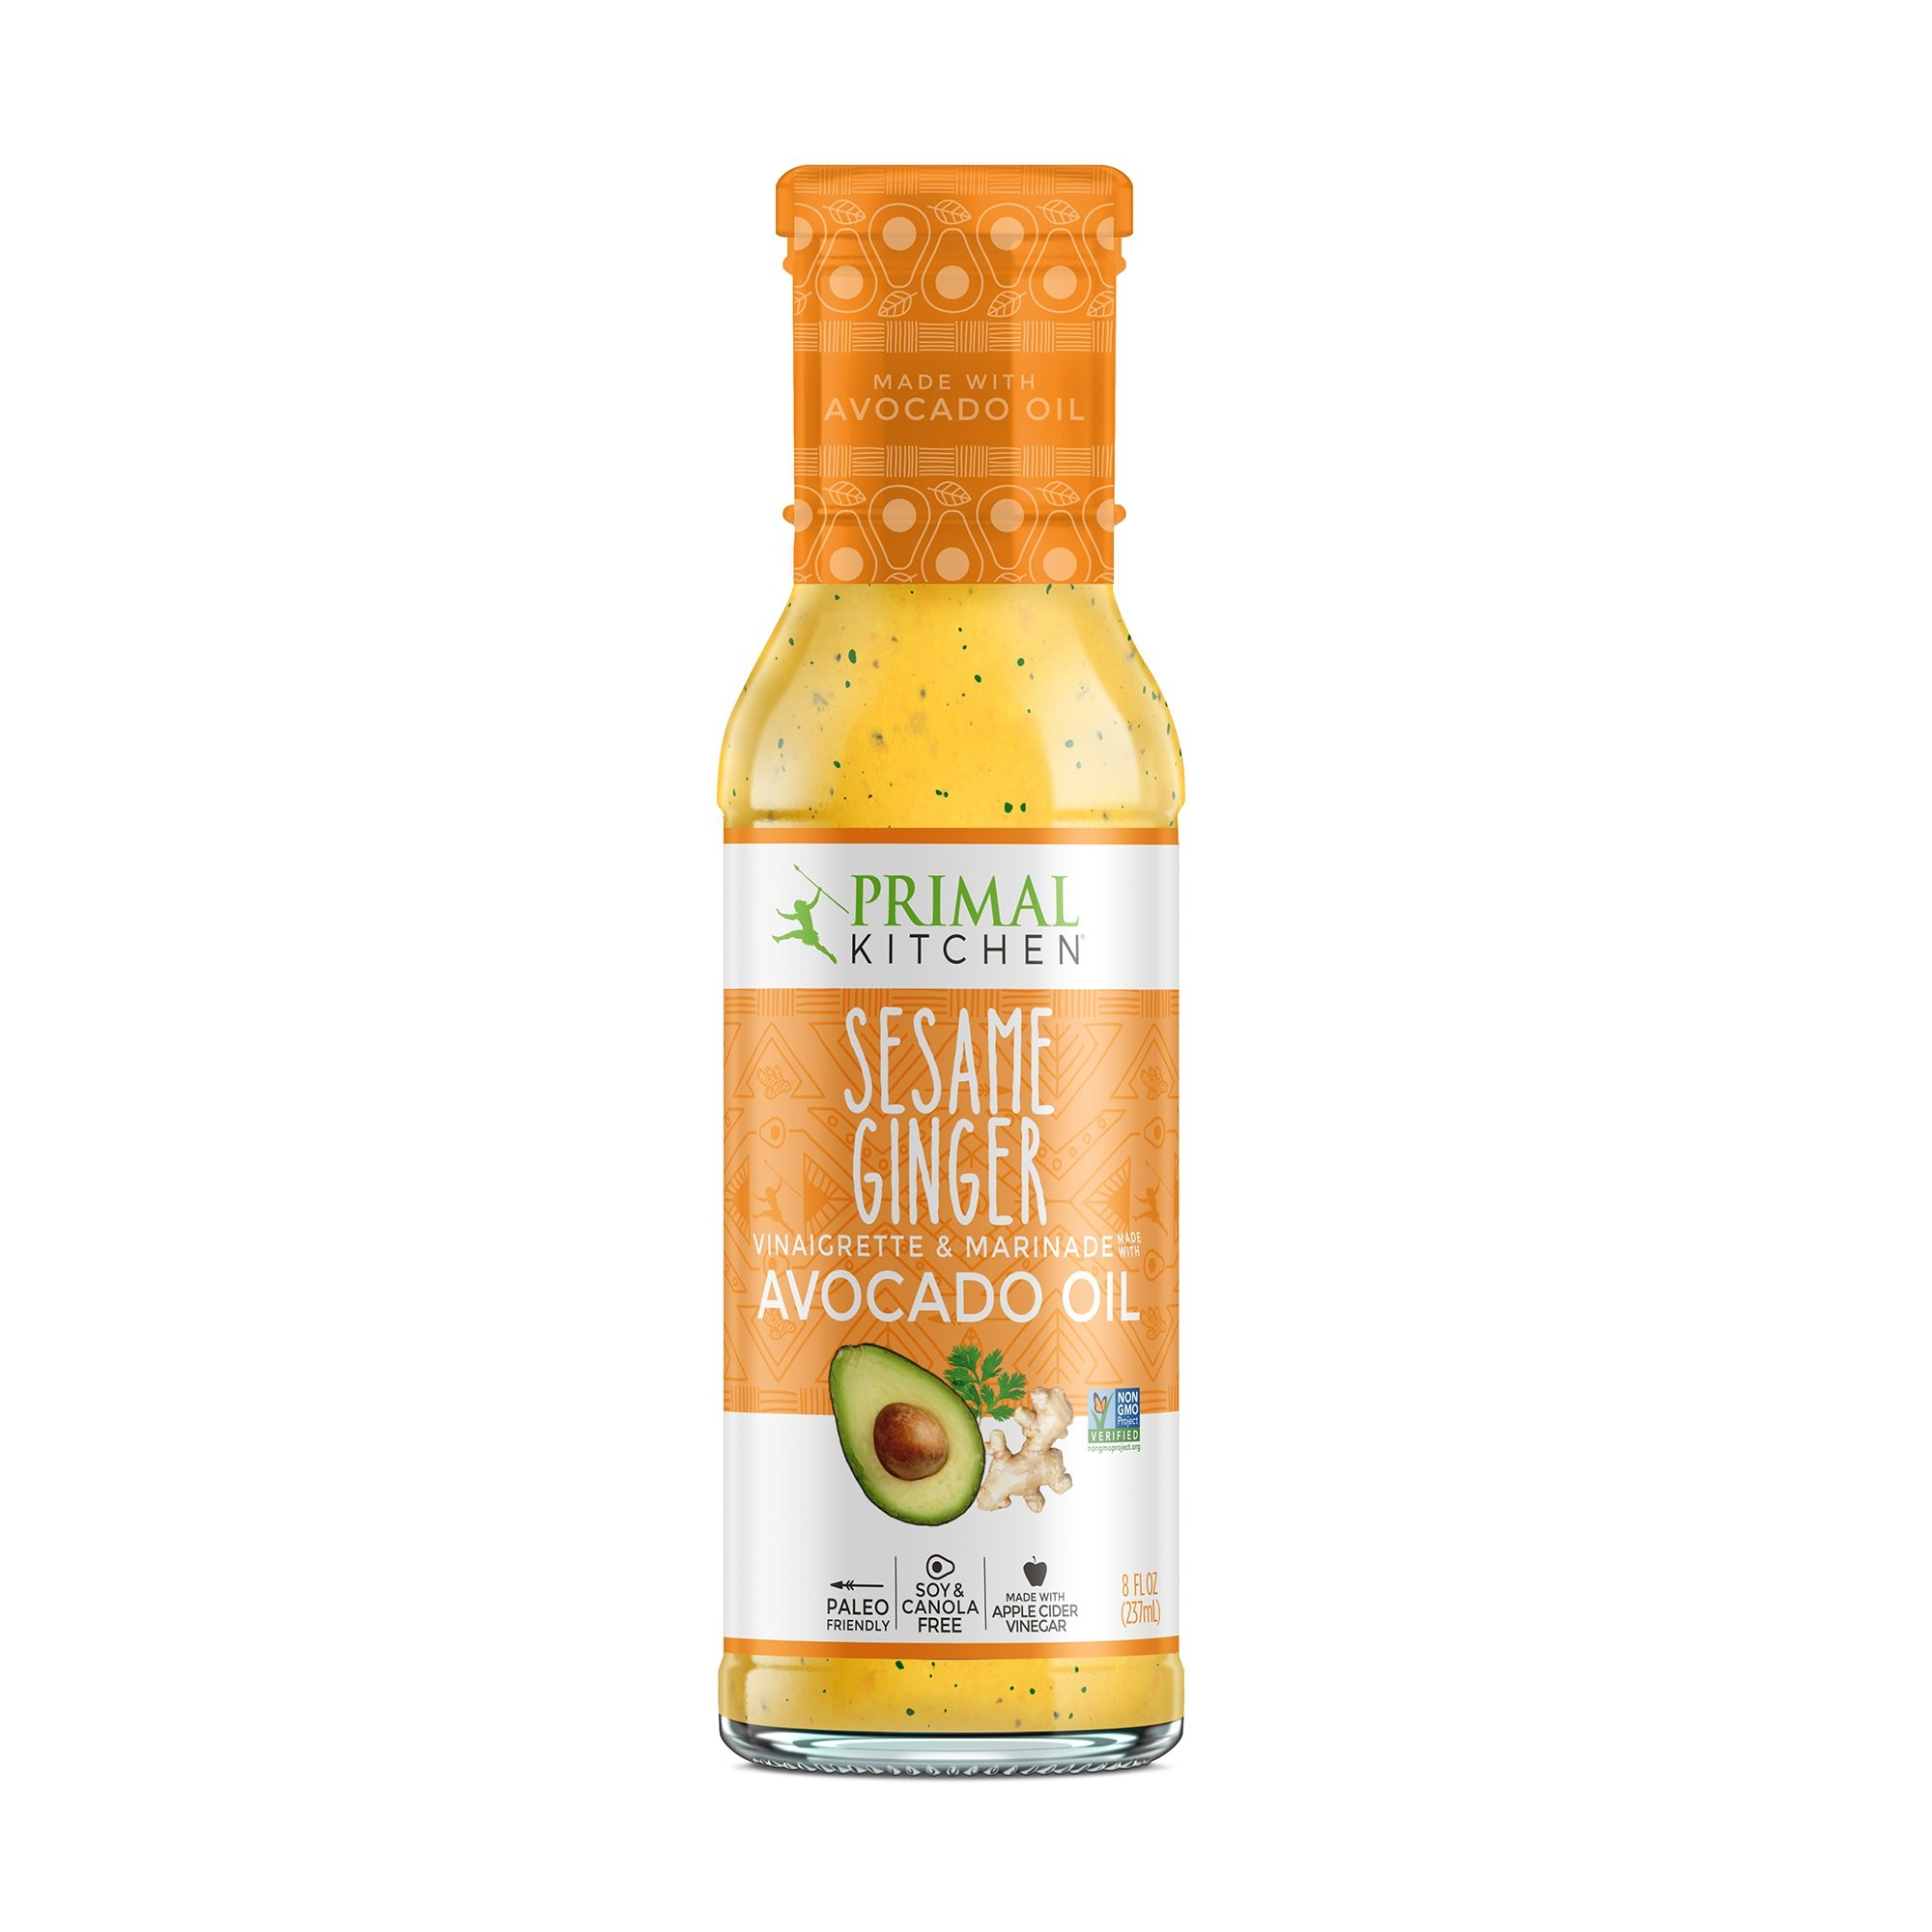 Primal Kitchen - Avocado Oil-Based Dressing and Marinade, Sesame Ginger Vinaigrette, 8 oz, Whole30 and Paleo Approved